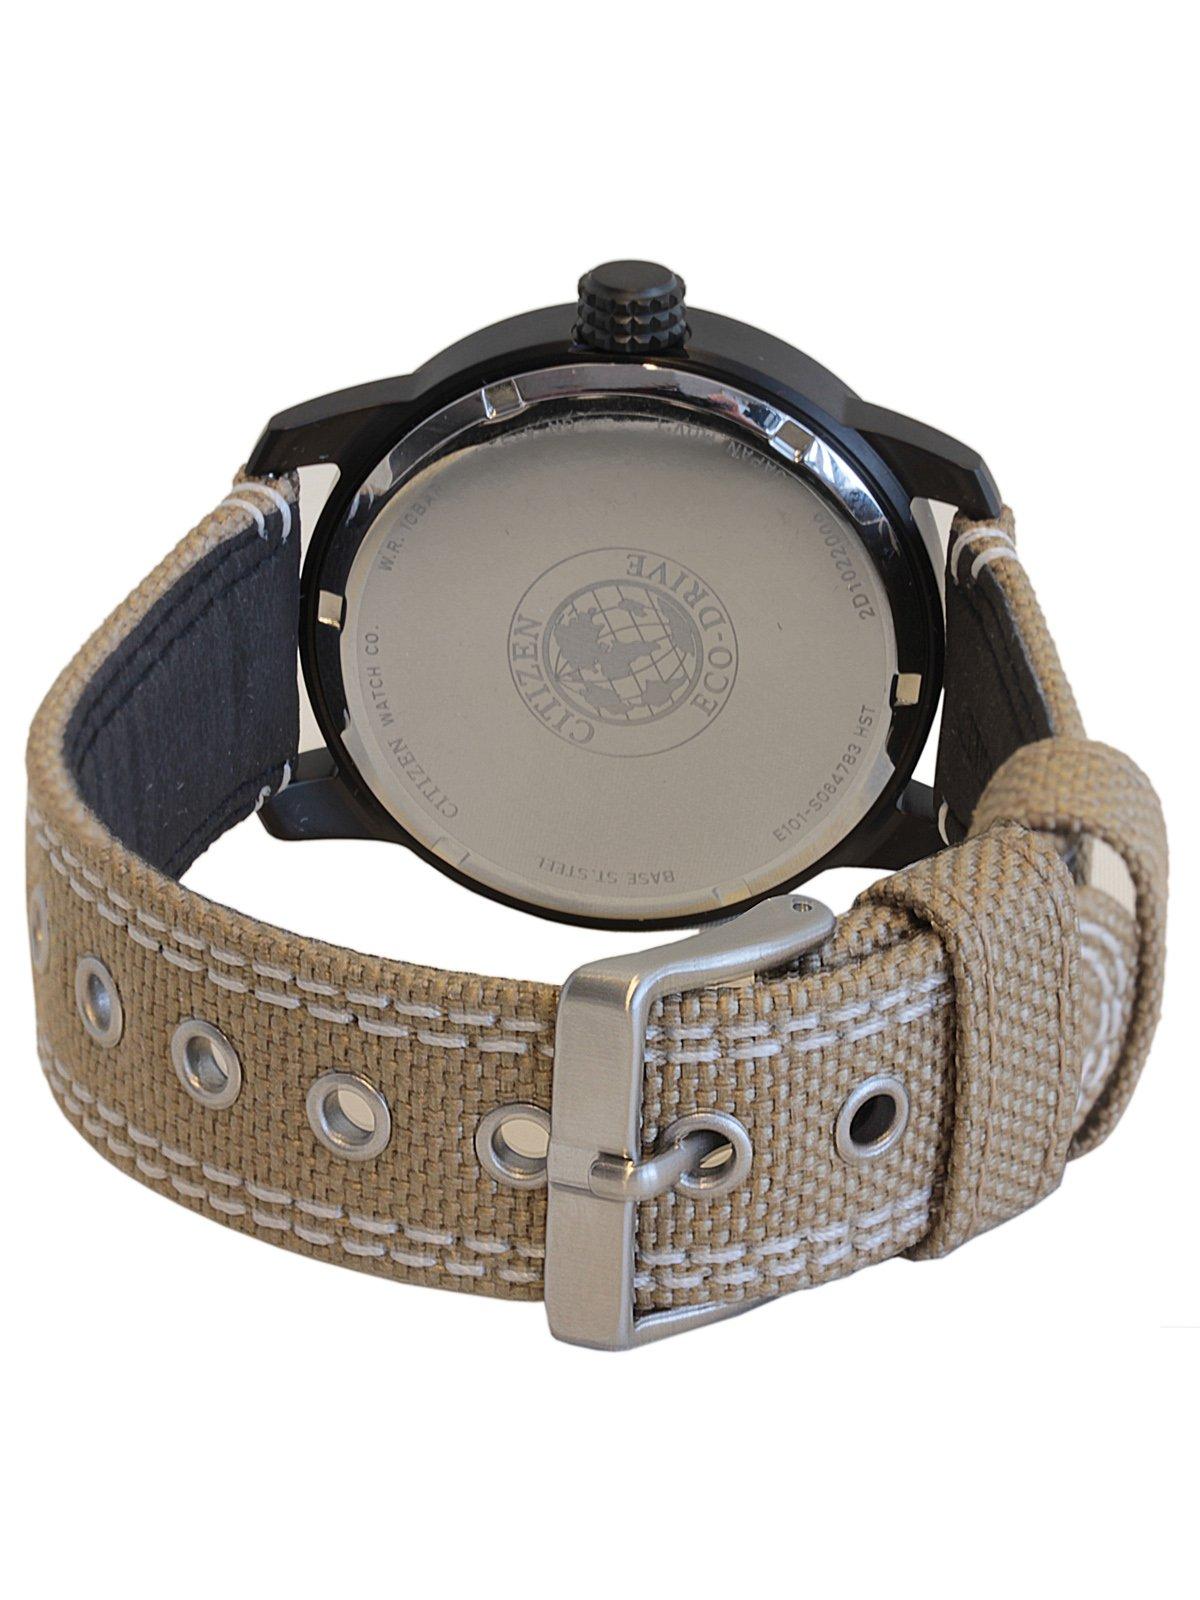 Citizen de Hombre Reloj de Pulsera Elegance analógico de Cuarzo, Eco Drive (Talla Única, Negro)